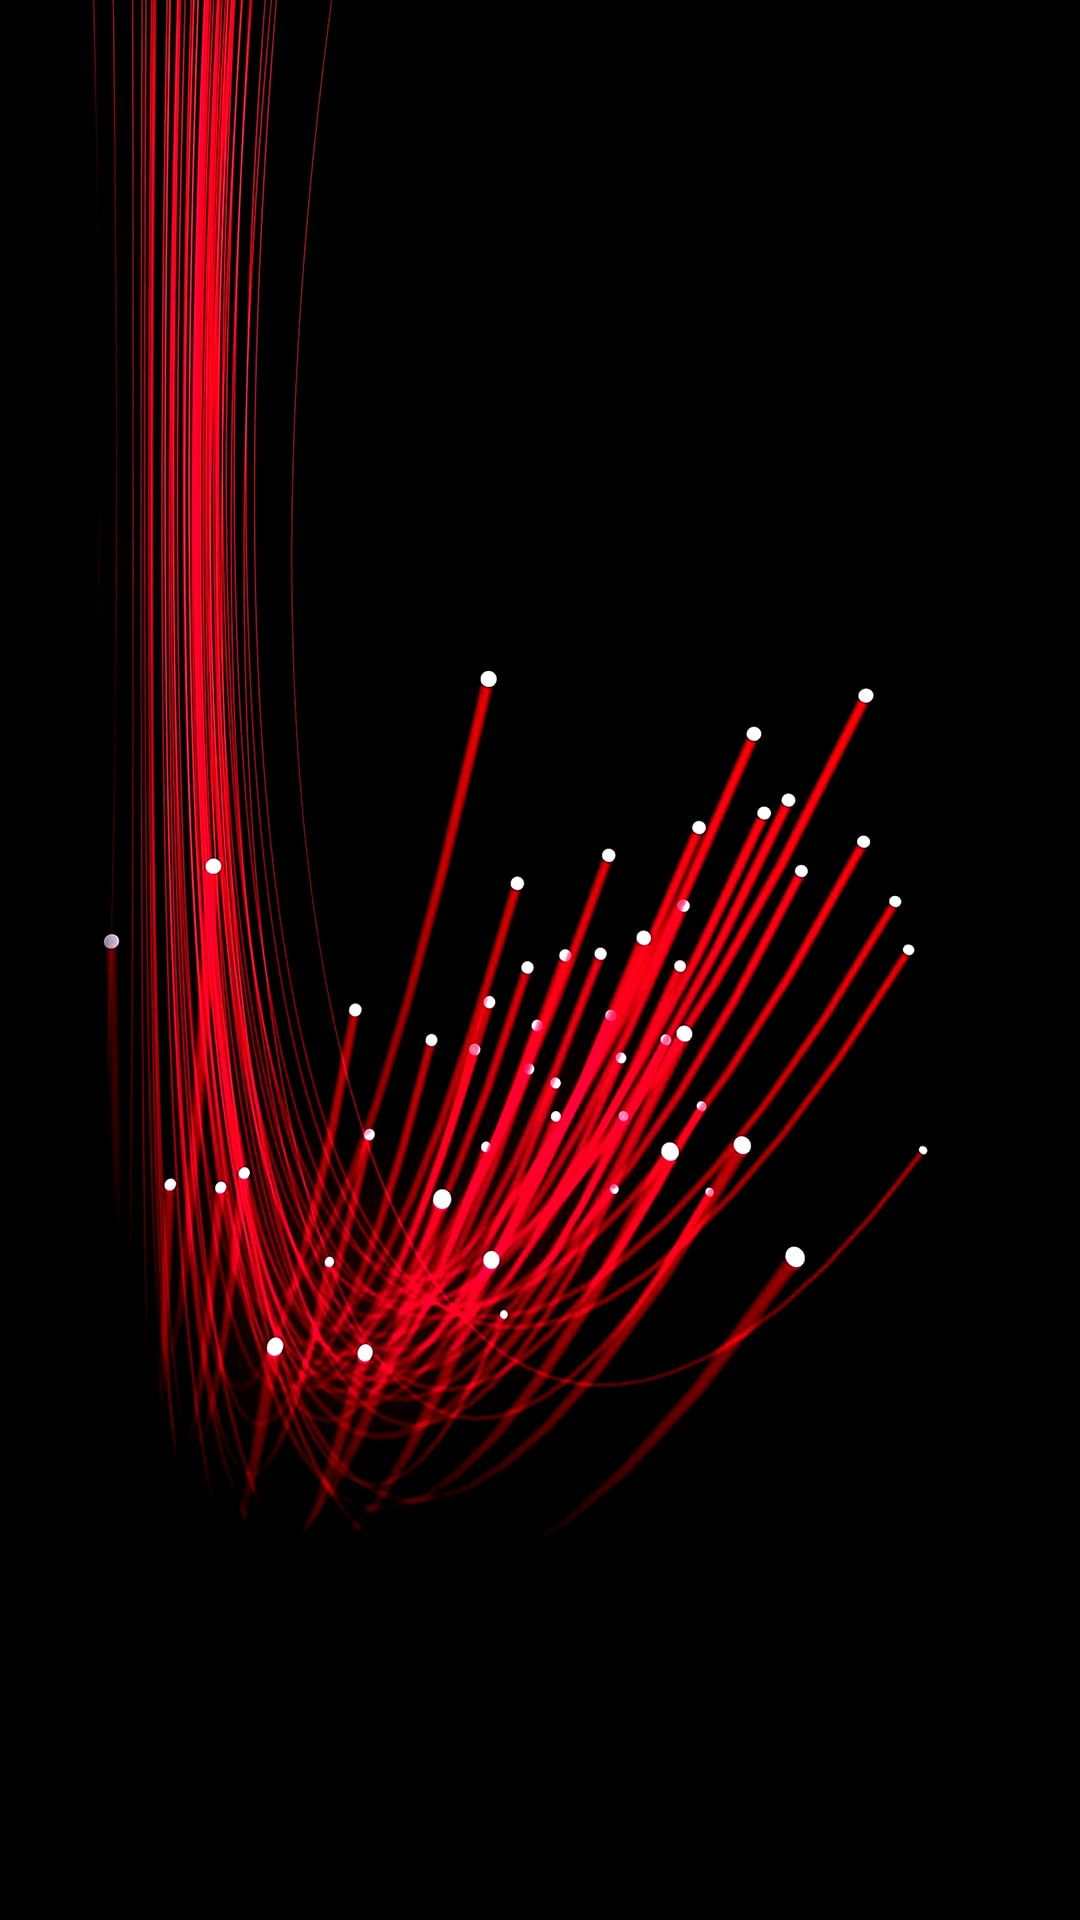 Black Background Minimalism Digital Art Abstract Optic Fiber Portrait Display 1080p Wallpaper Iphone Wallpaper Images Red And White Wallpaper Red Wallpaper